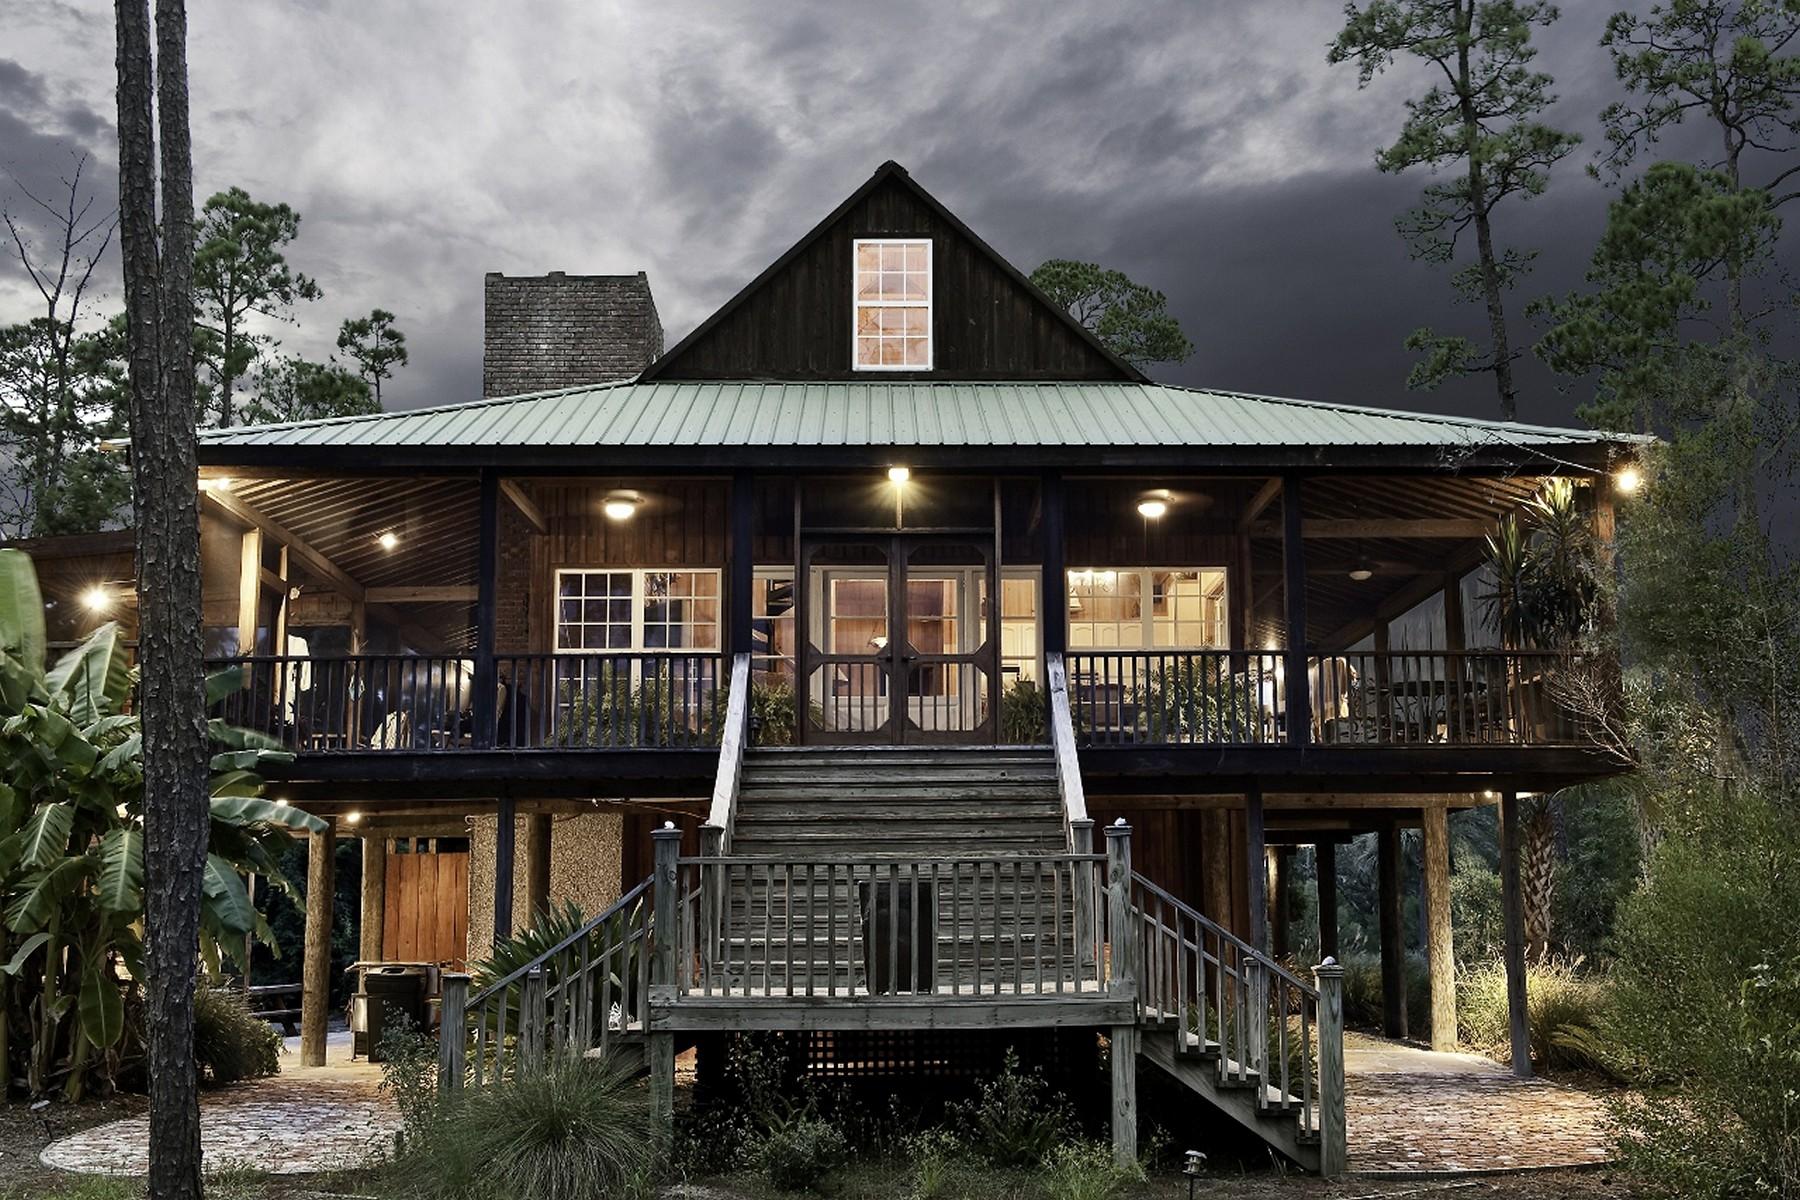 Đảo tư nhân vì Bán tại Lodge at Eagle Island Darien, Georgia 31305 Hoa Kỳ